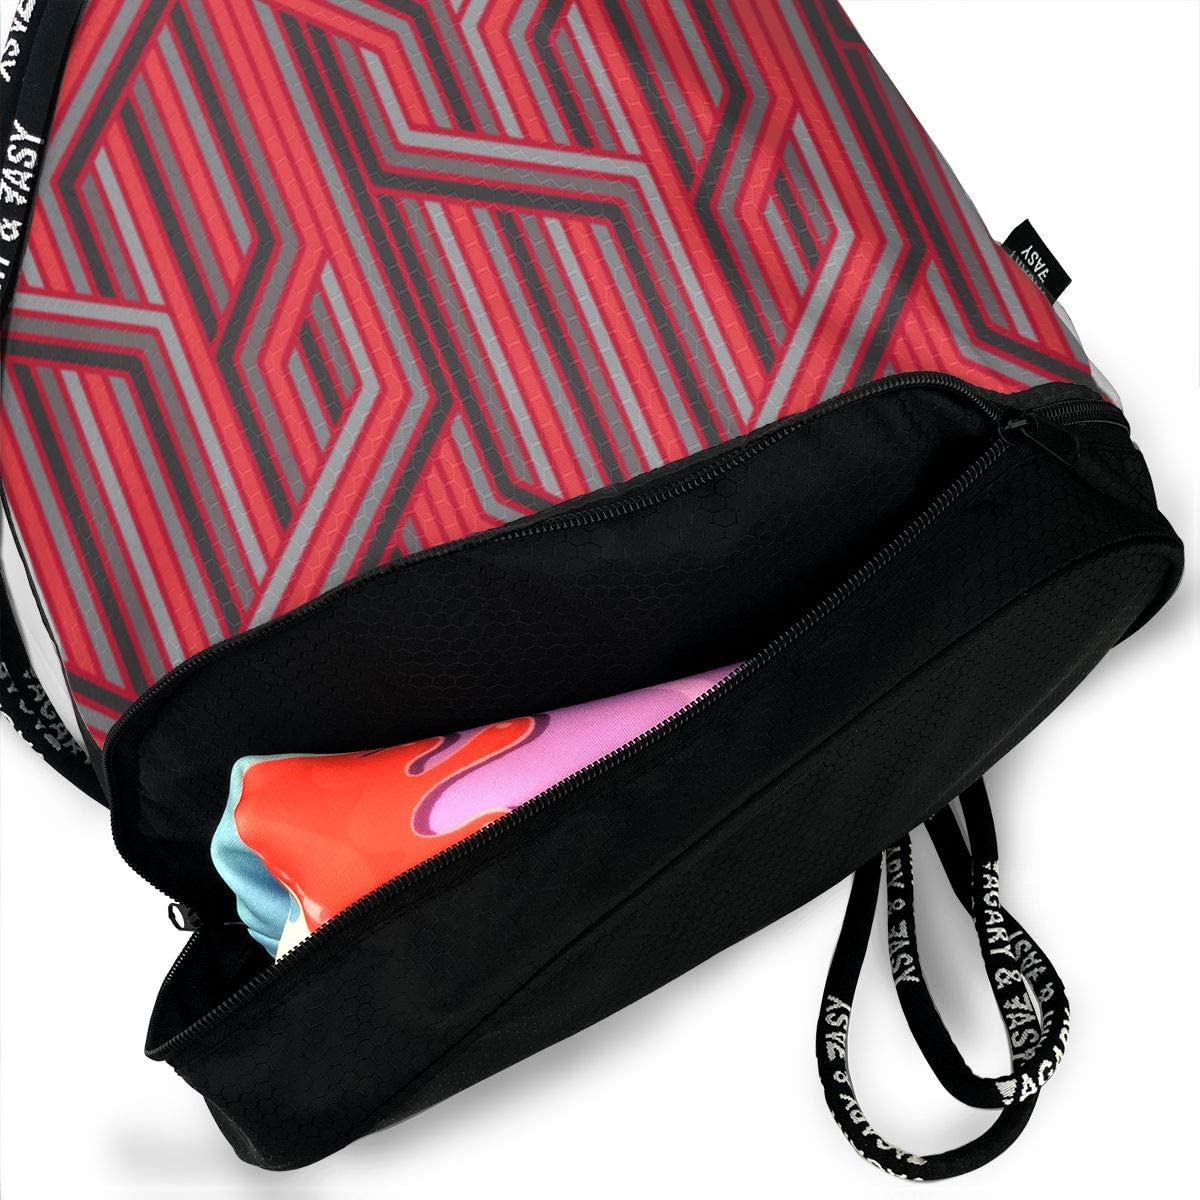 Manipulation Thames Night Drawstring Backpack Sports Athletic Gym Cinch Sack String Storage Bags for Hiking Travel Beach